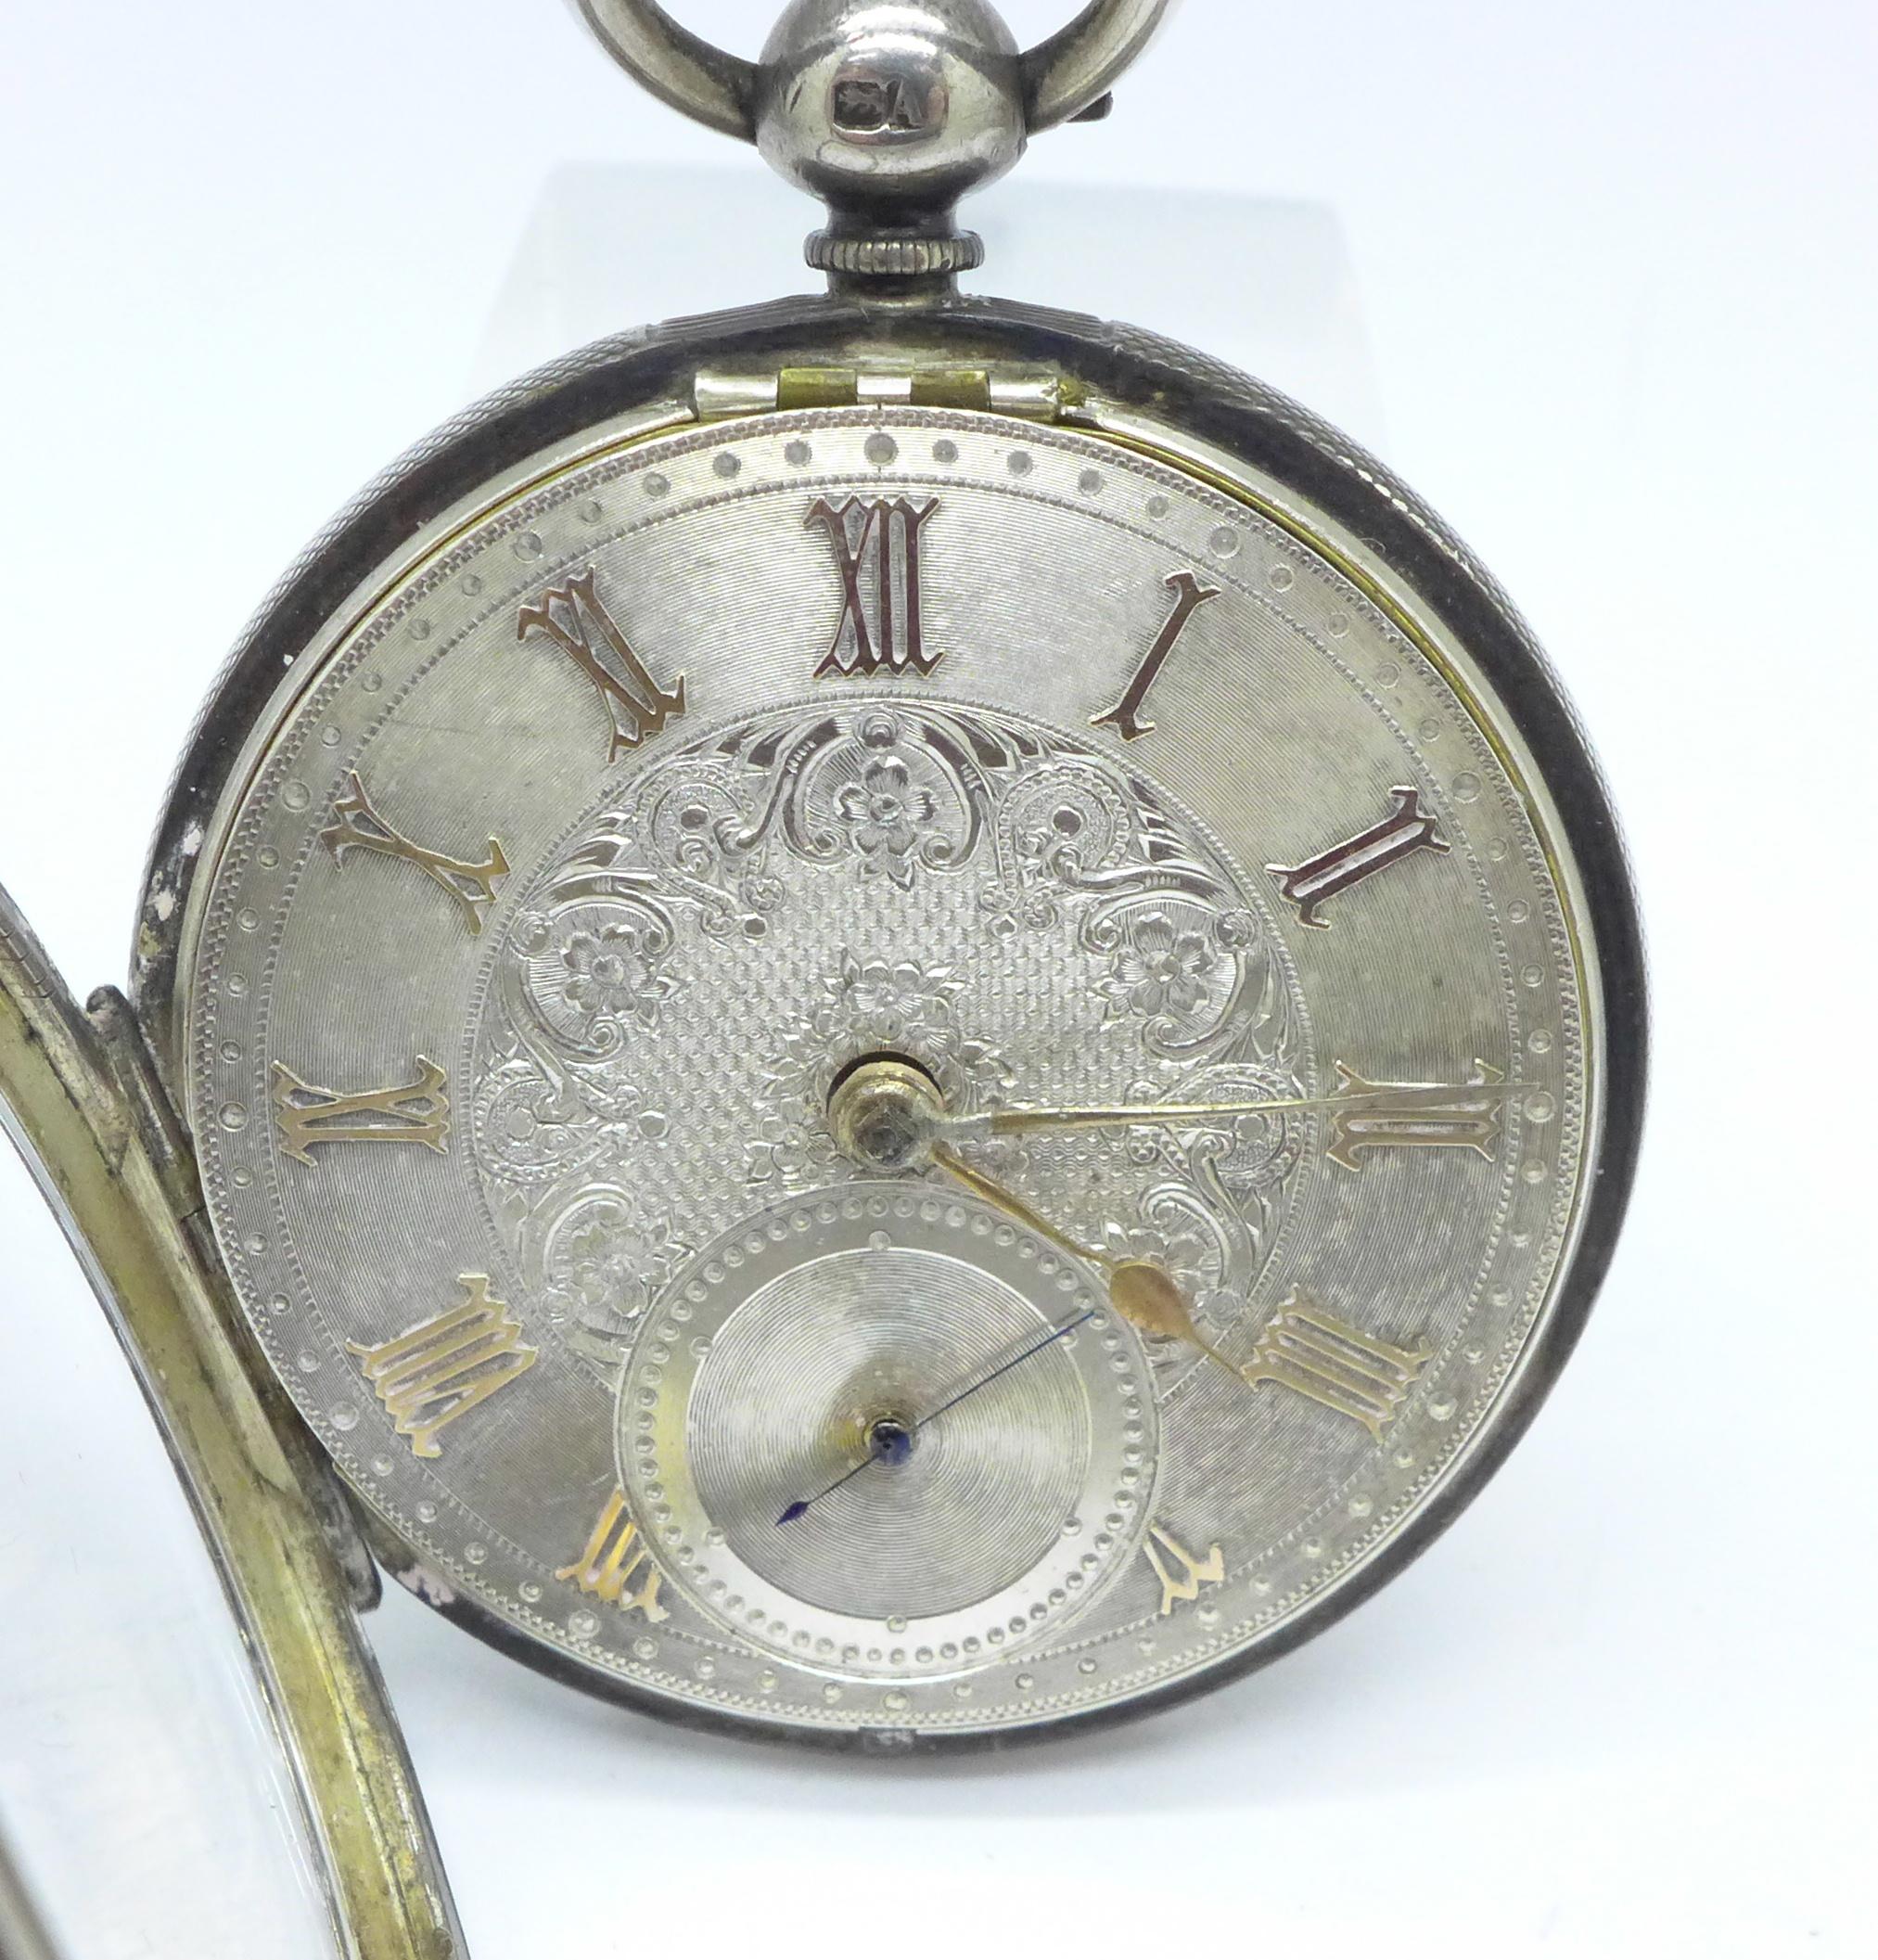 Lot 935 - A silver pocket watch by Benson